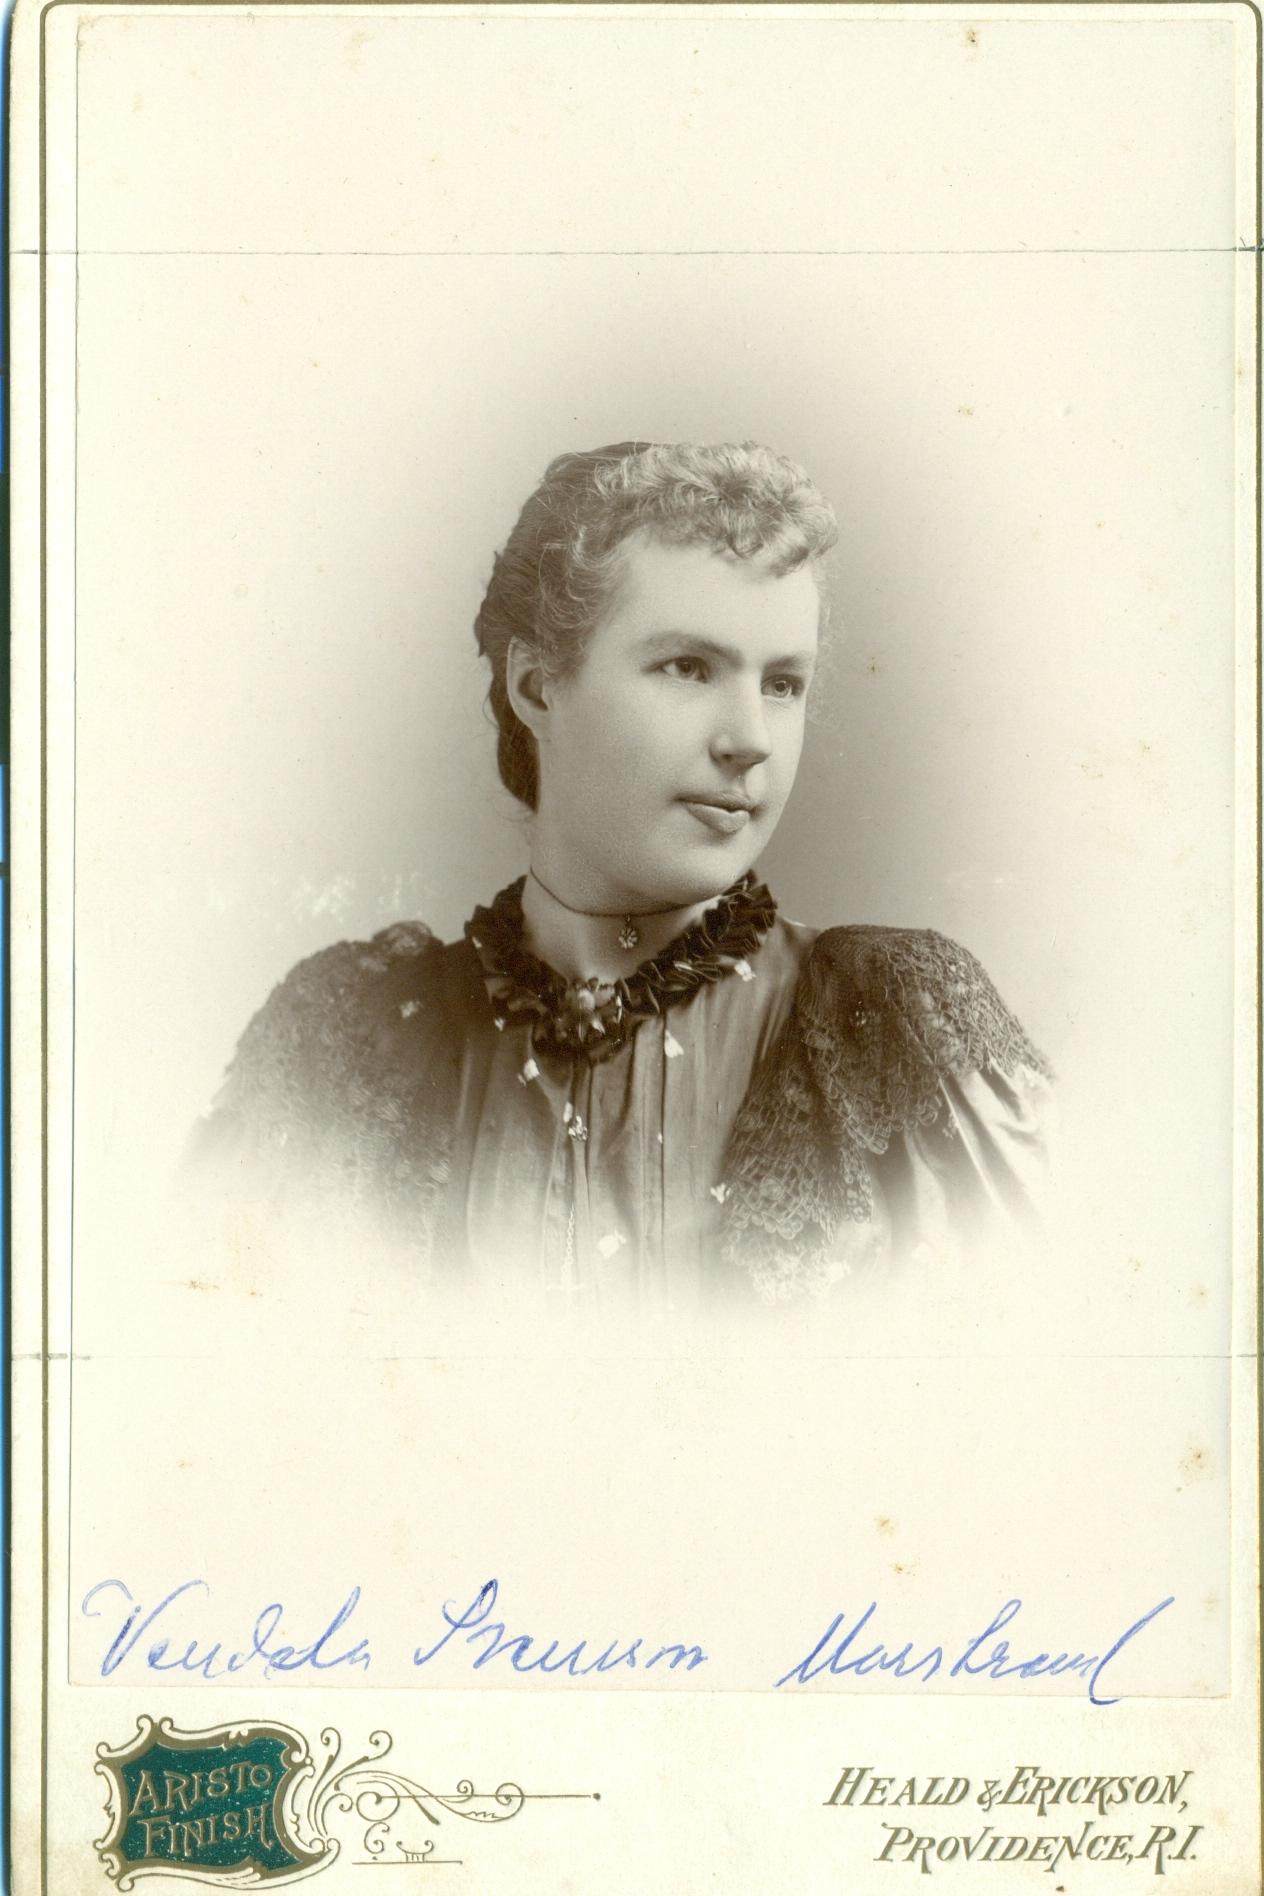 Vendela Svensson,f.11nov. 1871, emigr. 1890,Finnekumla__Providence USA, framsida